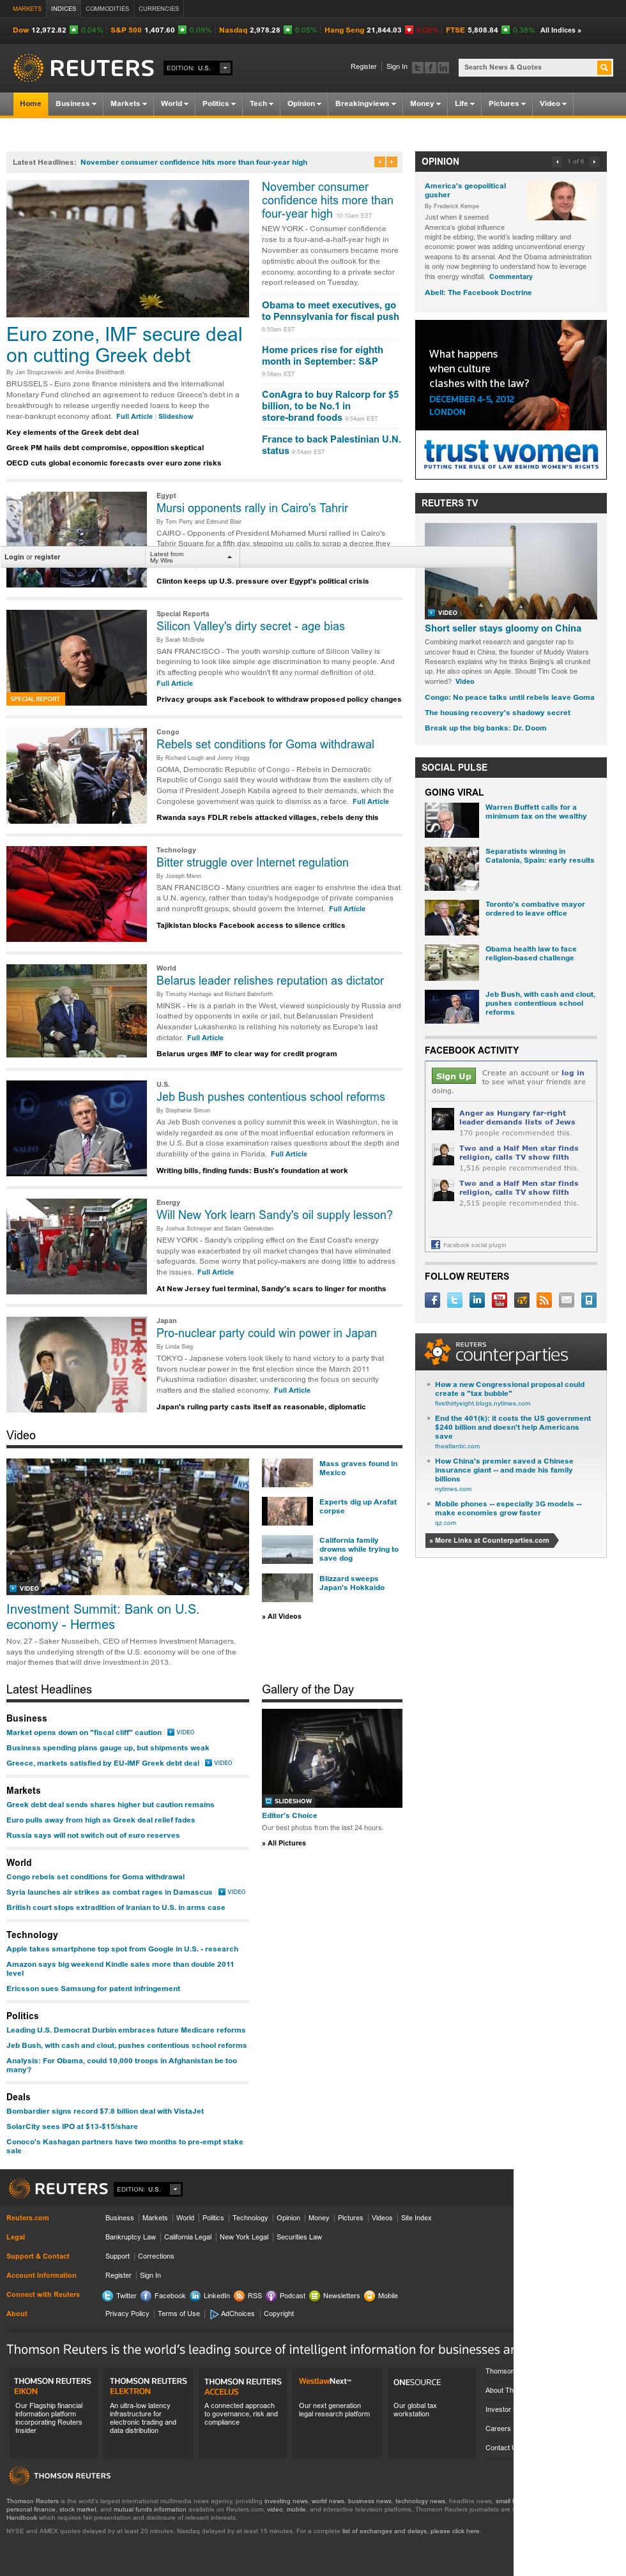 Reuters at Tuesday Nov. 27, 2012, 3:25 p.m. UTC